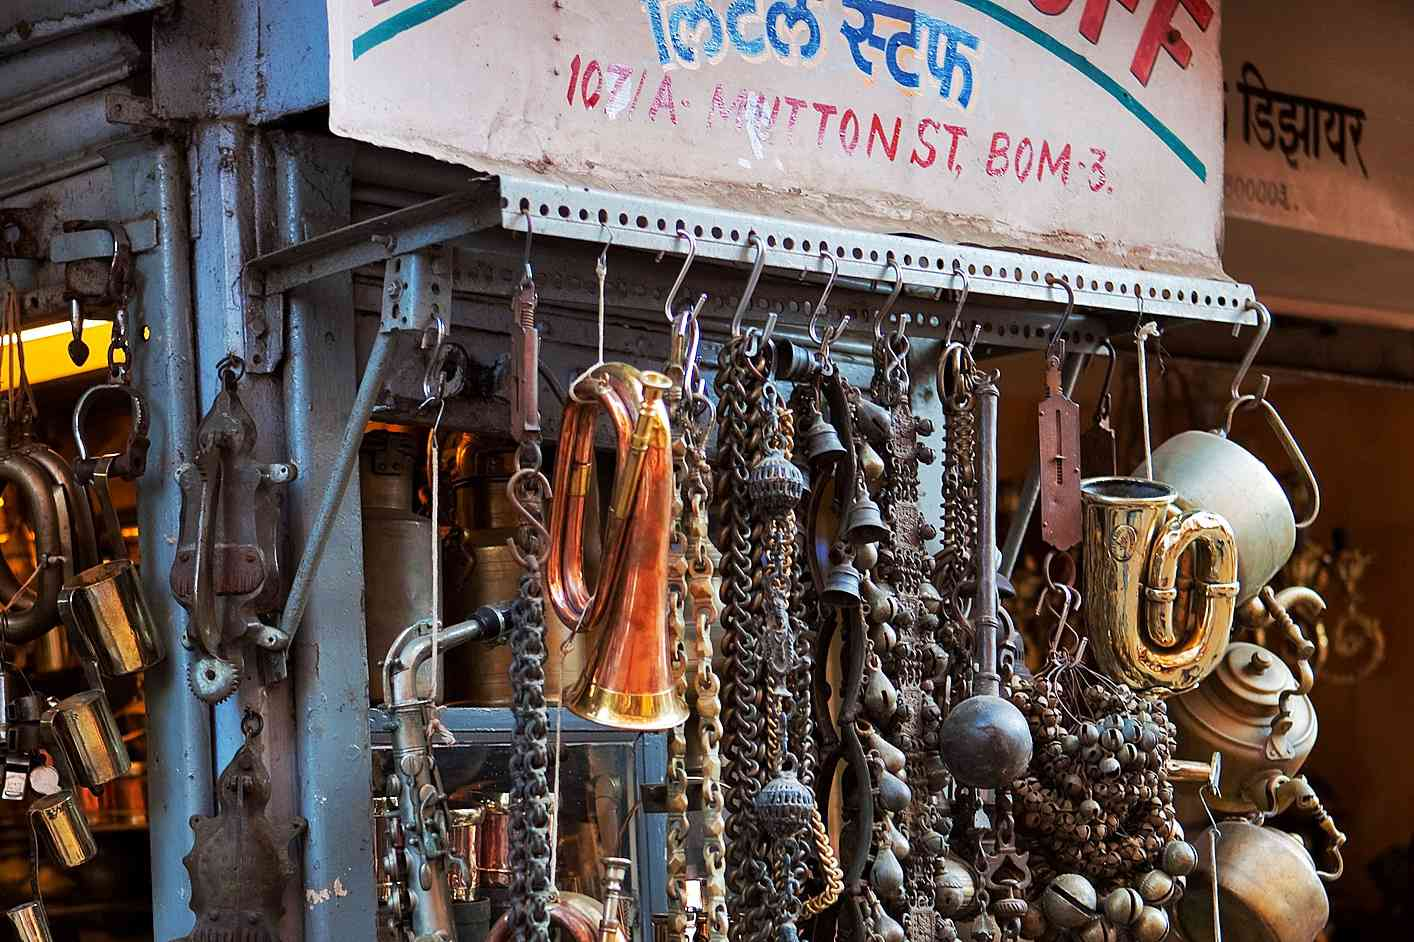 Little Stuff, at 107/A Mutton Street, Mumbai.